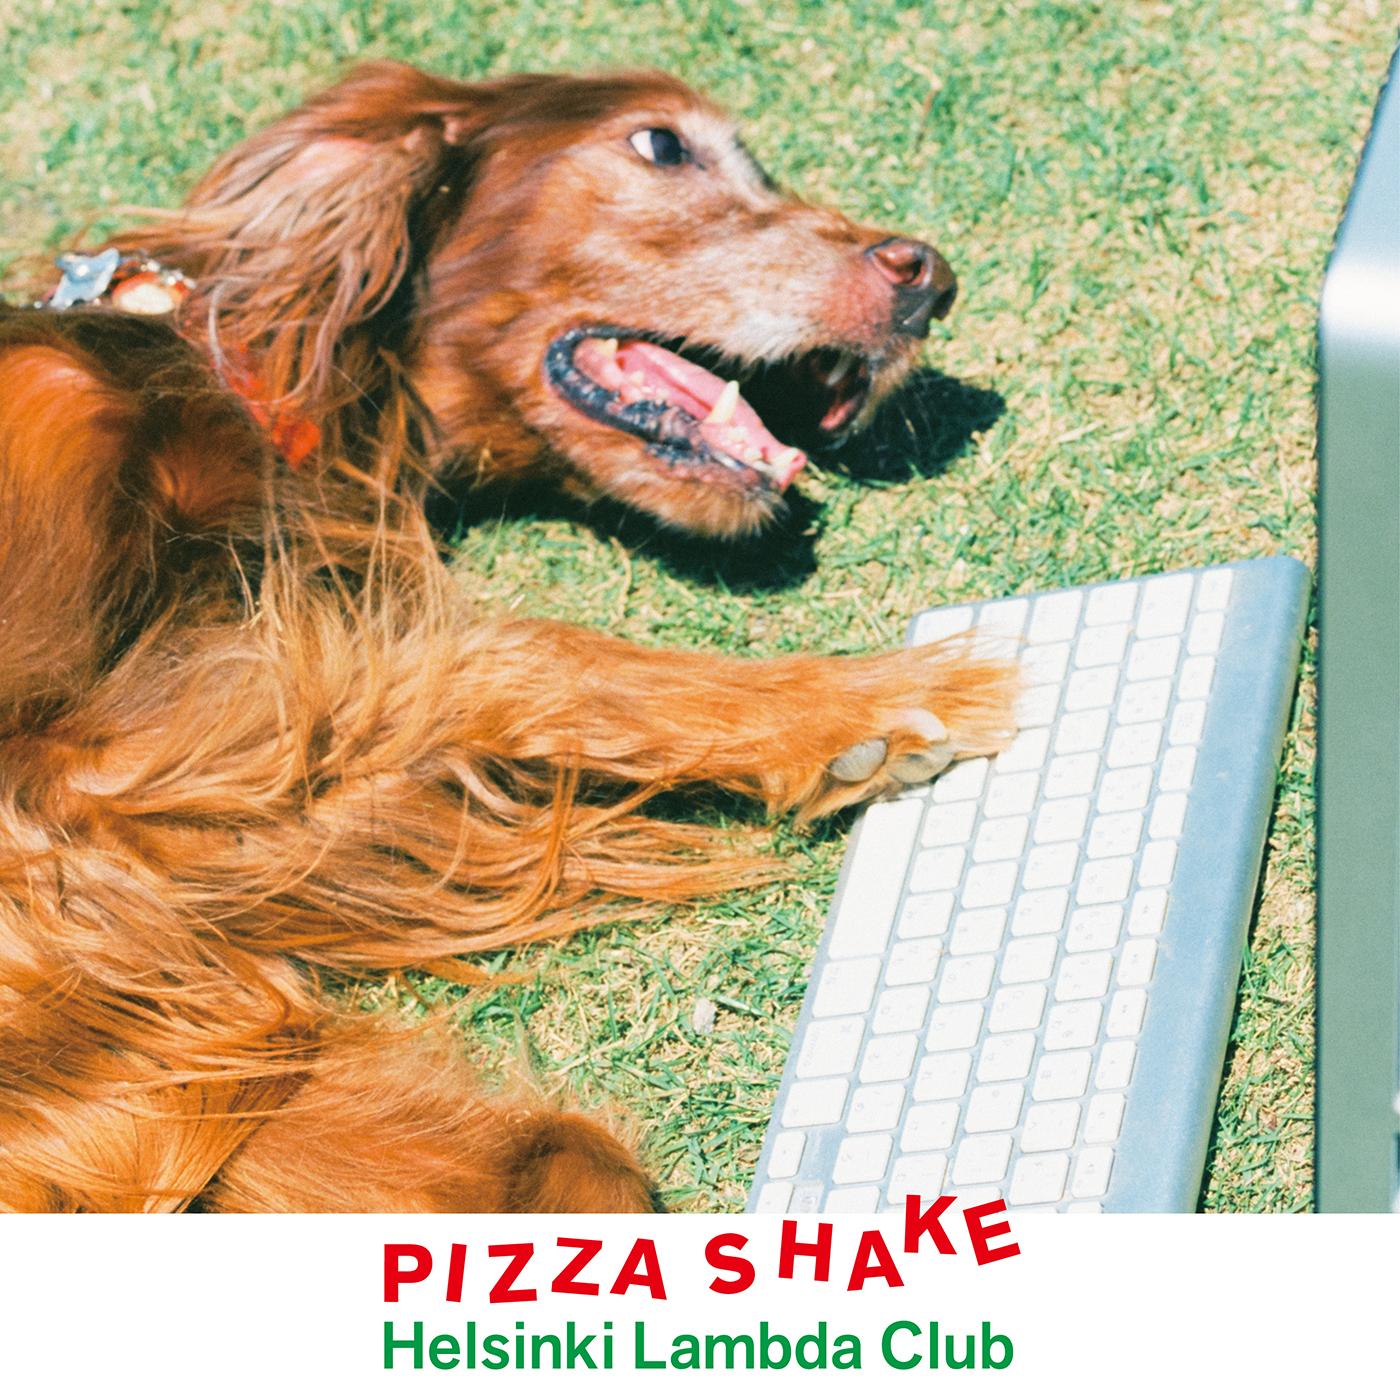 hlc_pizzashake